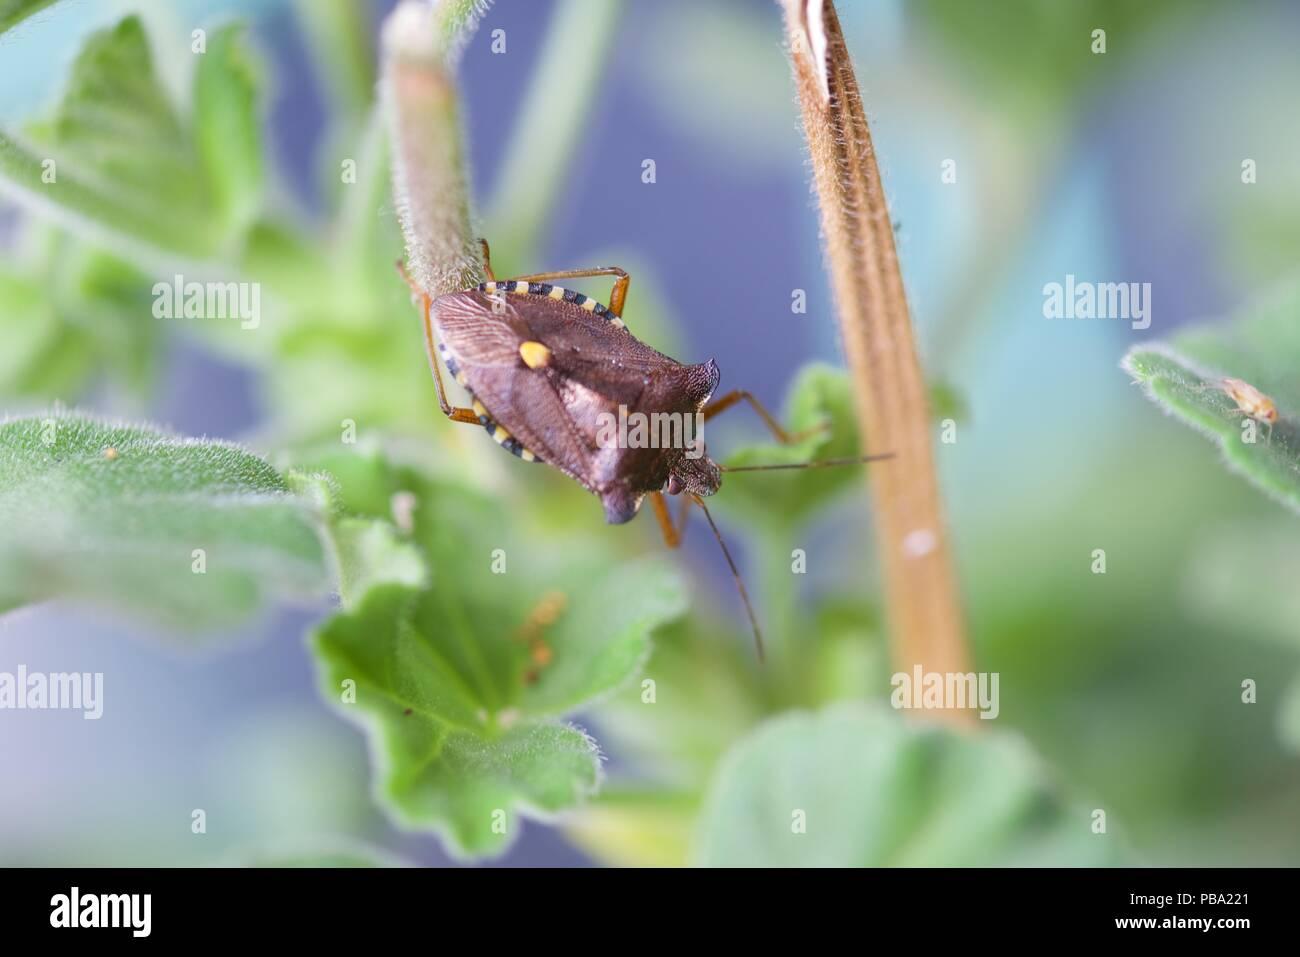 Plant bug (Miridae): a lone leaf bug, mirid bug, plant bug, or grass bug - Stock Image